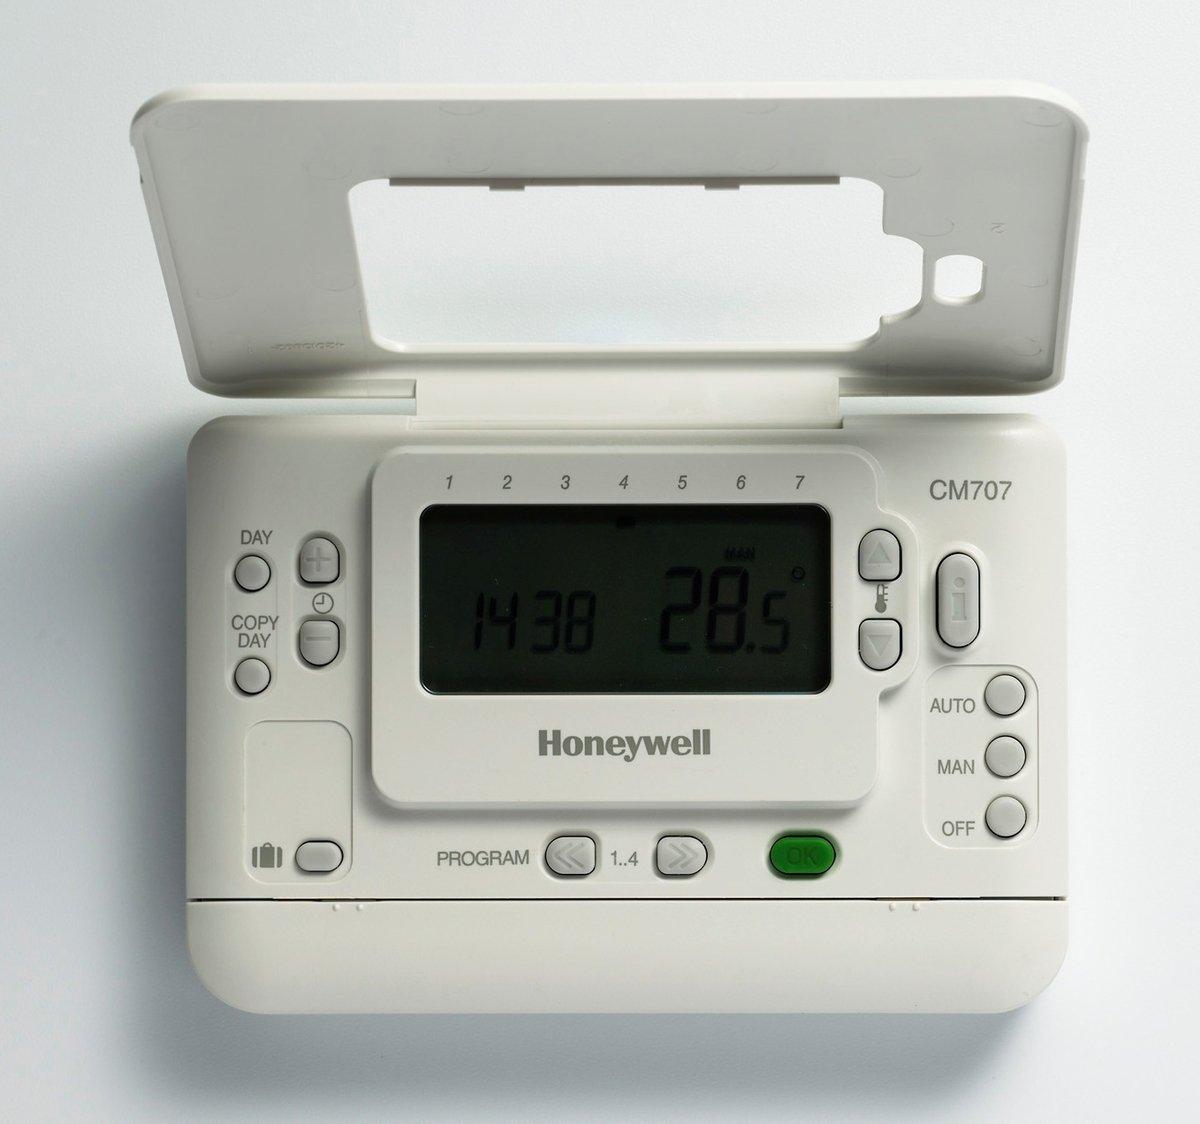 0 W Honeywell Home CMT707A1003 Cronotermostato Honeywell CM707 Blanco 160 X 114 X 50 0 V